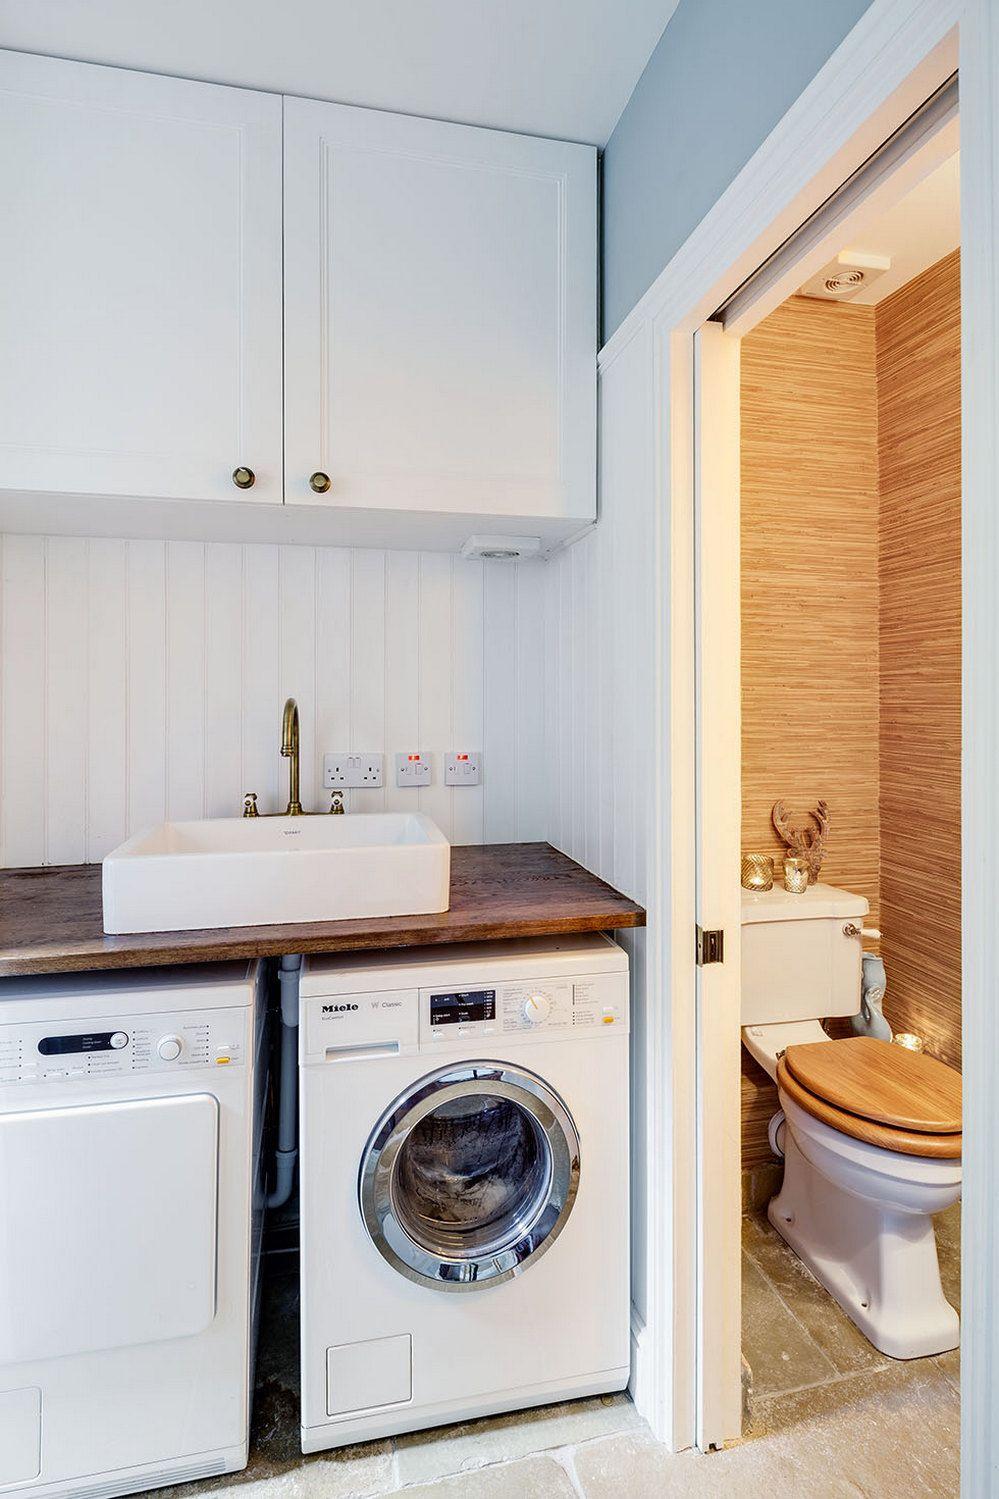 20 Amazing Flat Sink Ideas For Your Bathroom